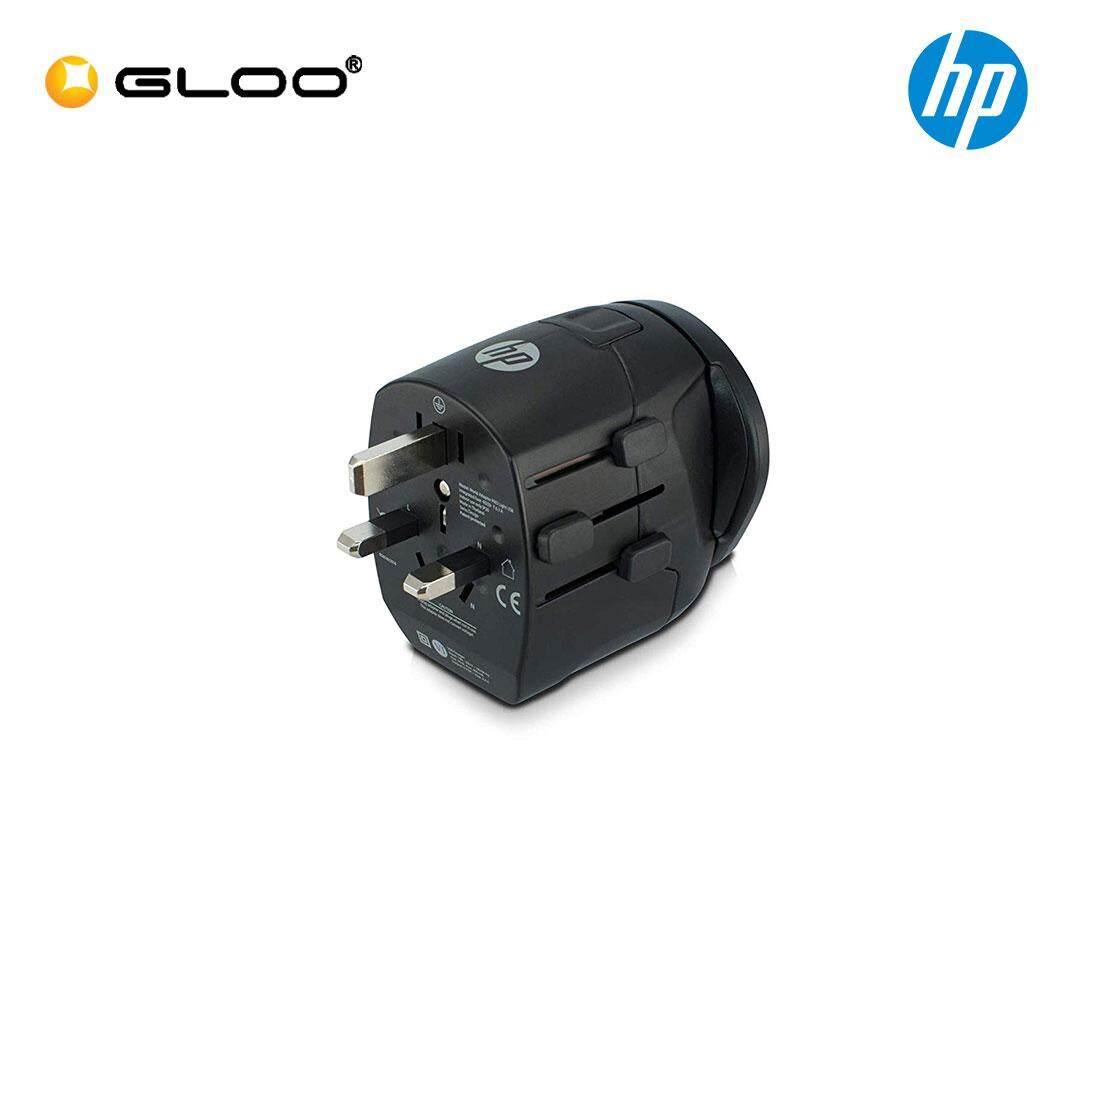 HP World Travel Adapter (2UX37AA)